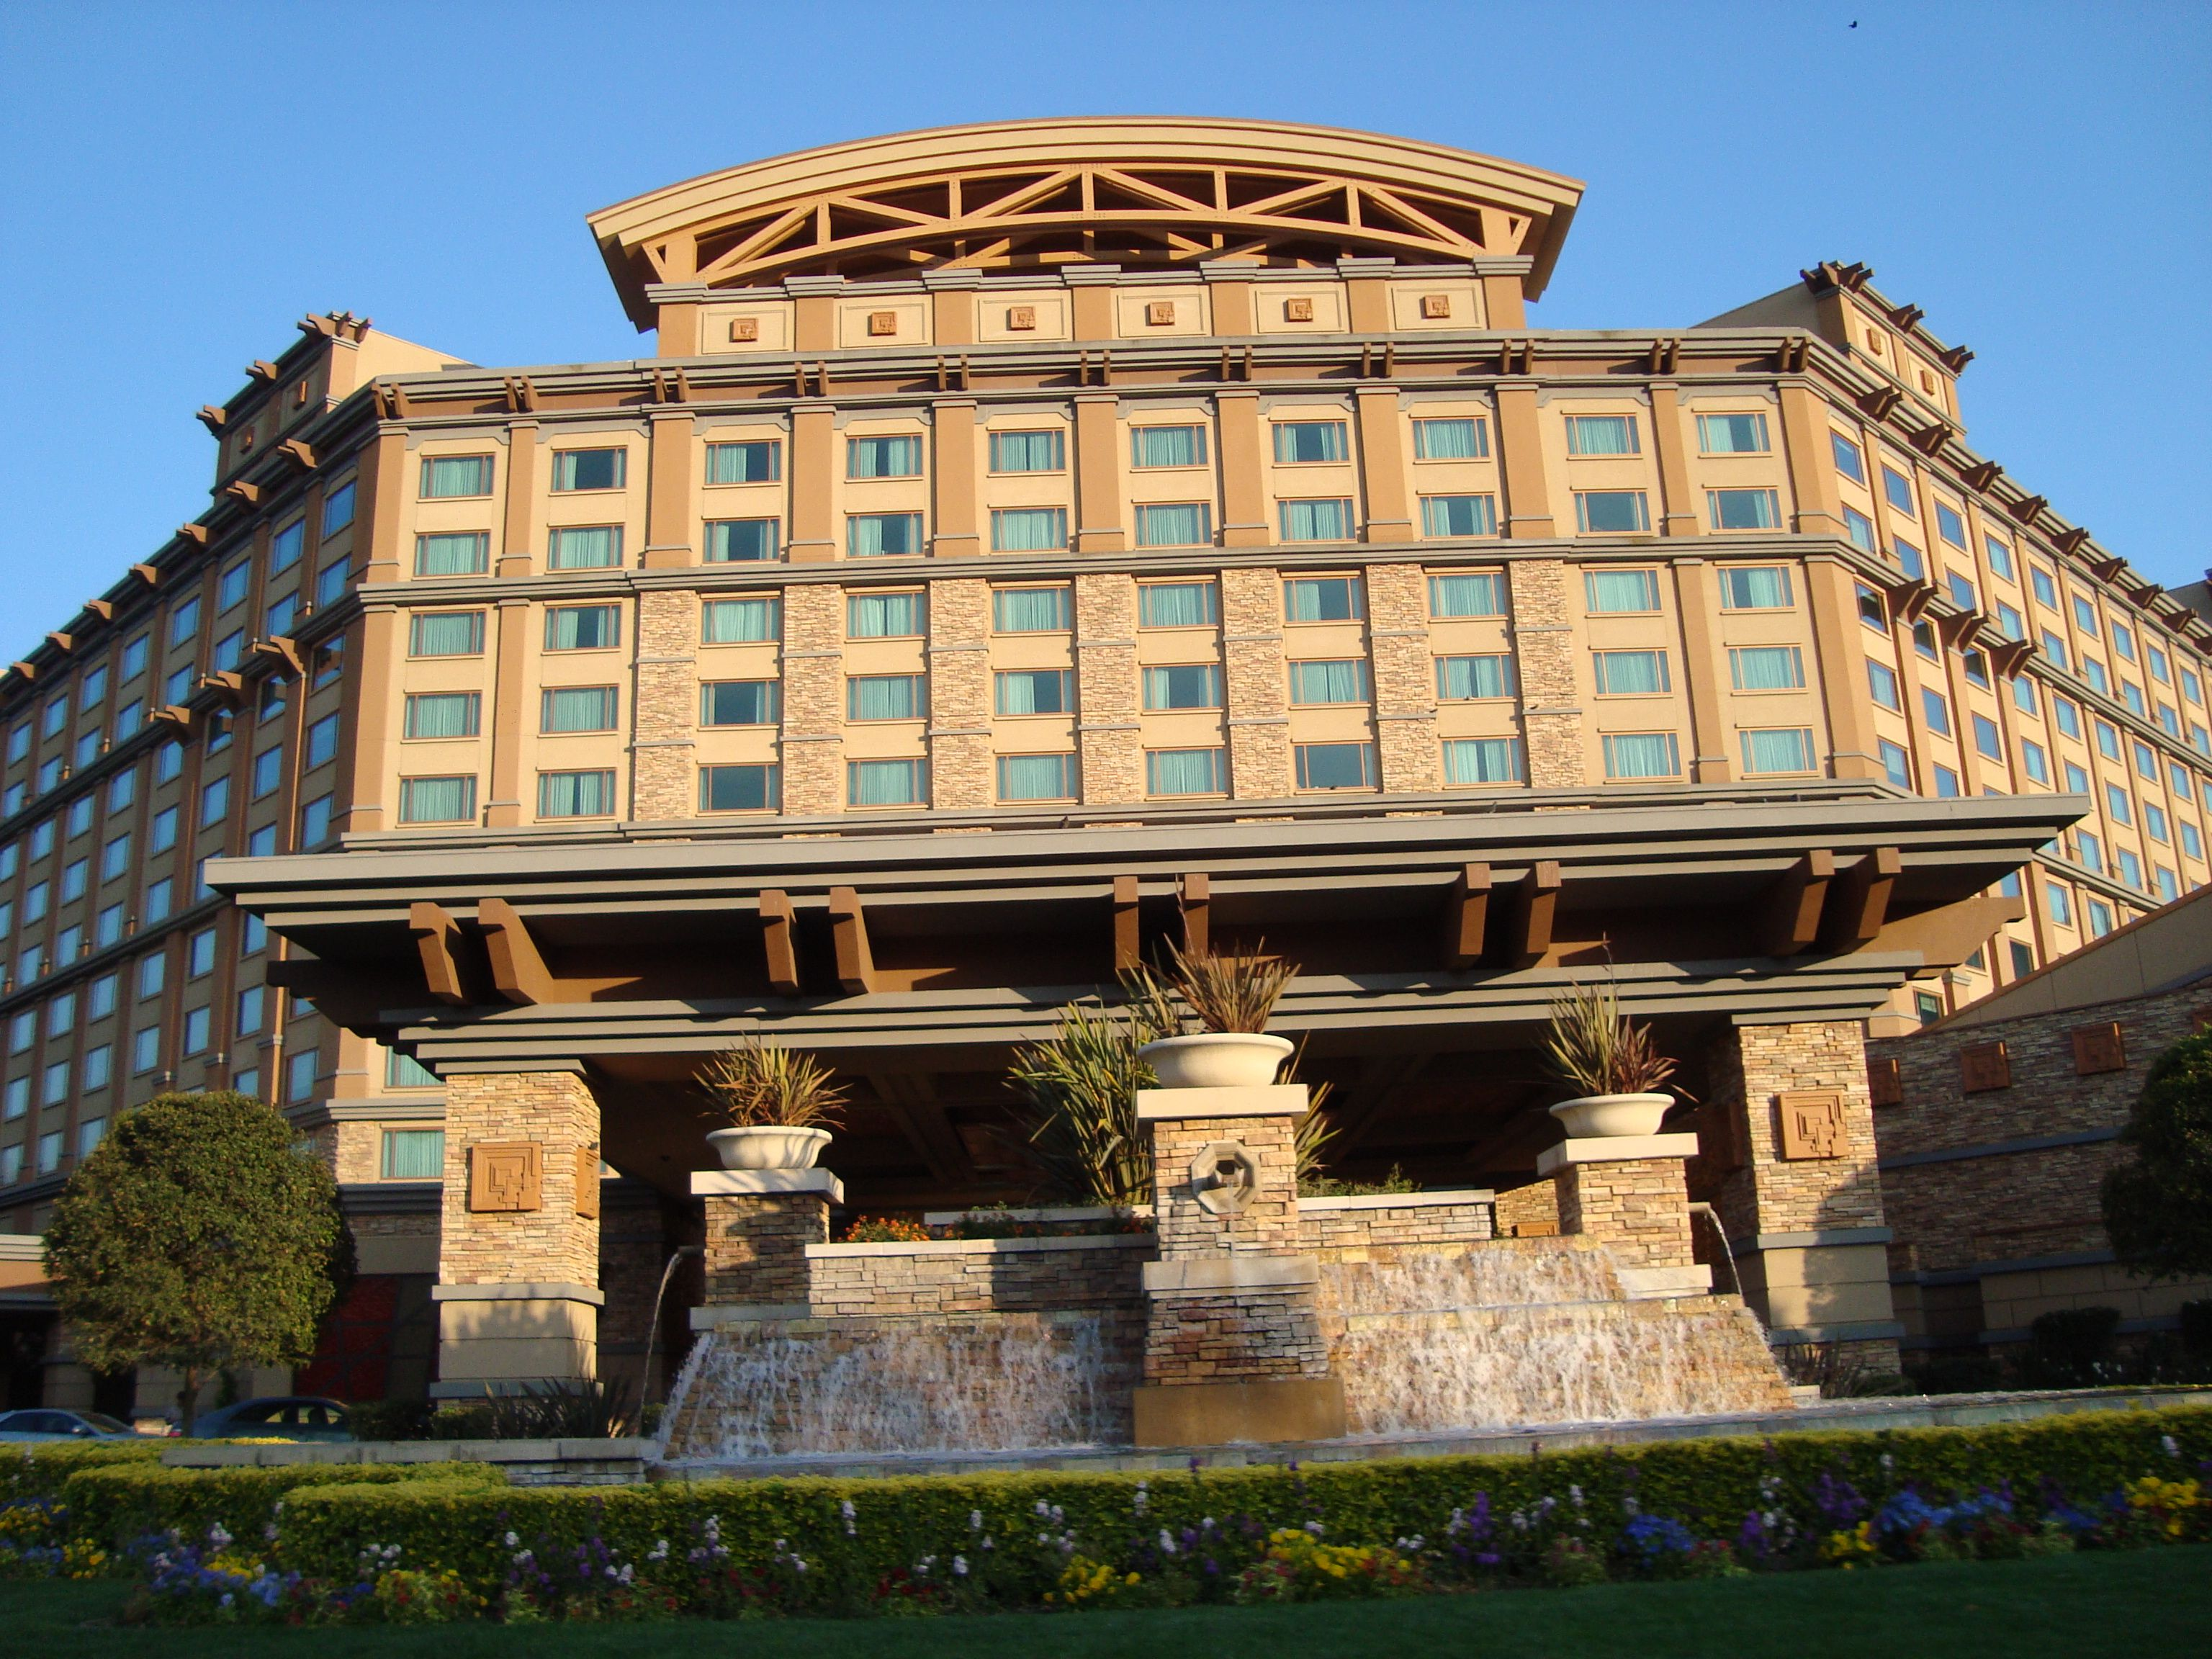 Temecula ca casino pala tulalup casino resort